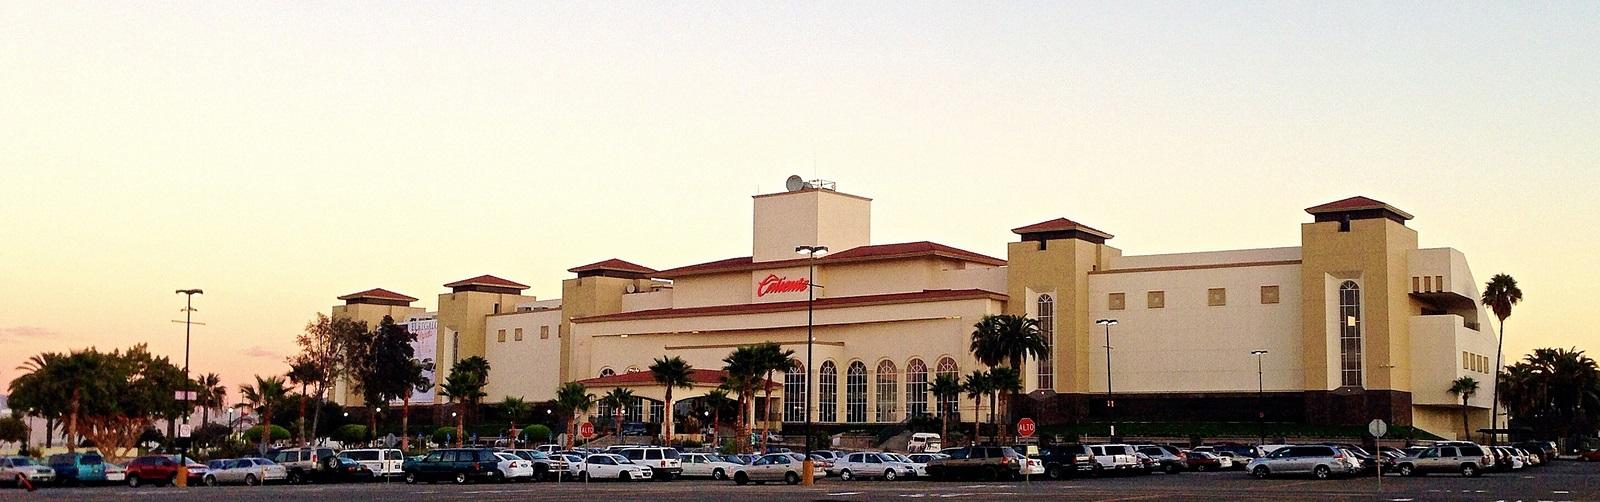 Casino caliente tijuana plaza rio